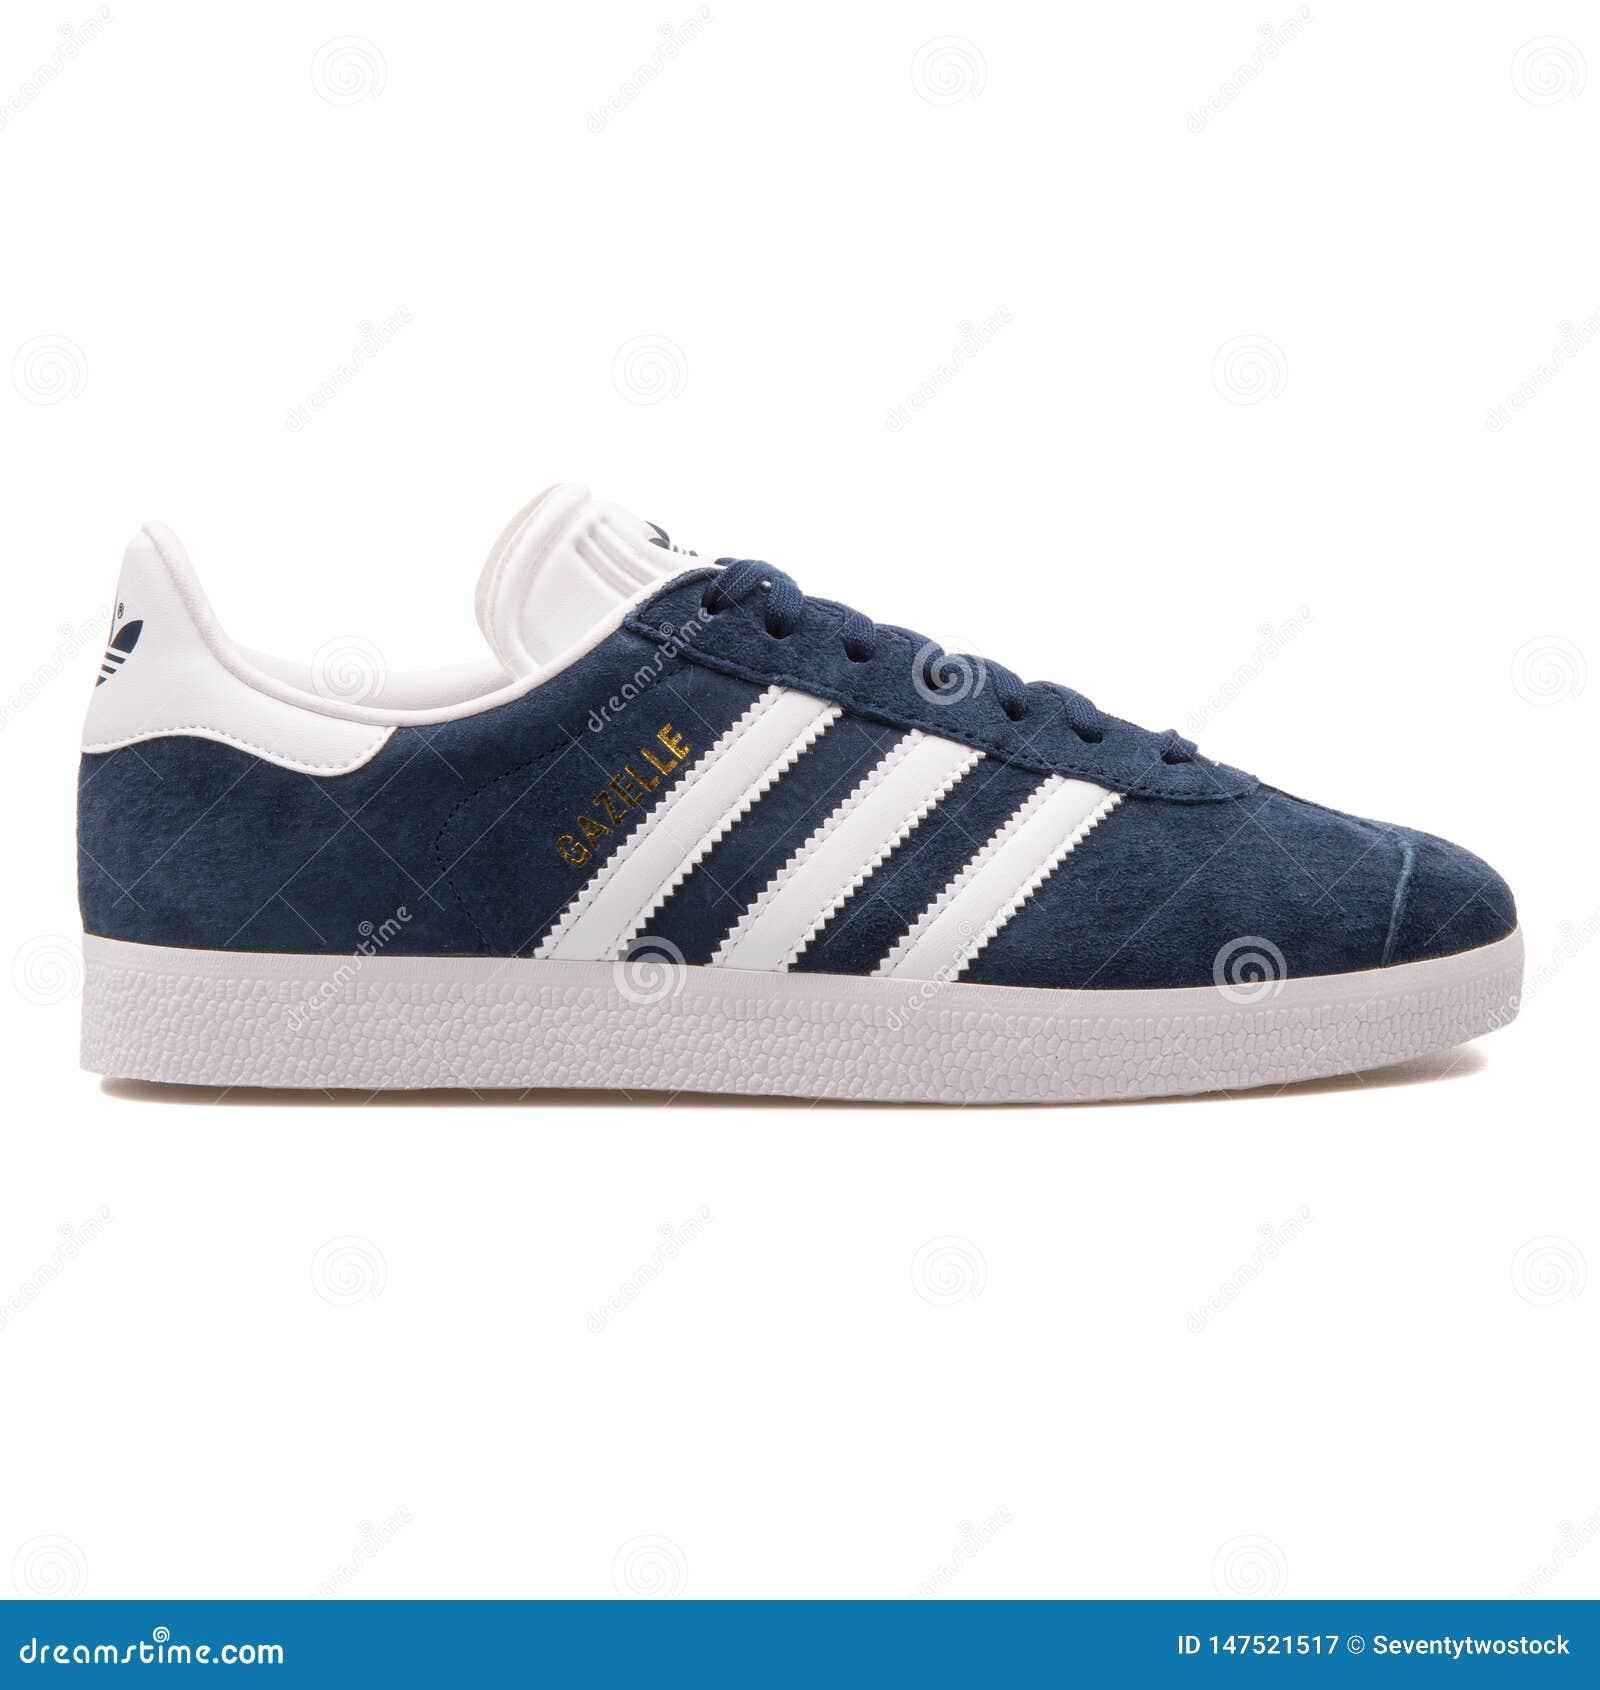 adidas Gazelle OG Navy Pink In blue please! | Sneakers